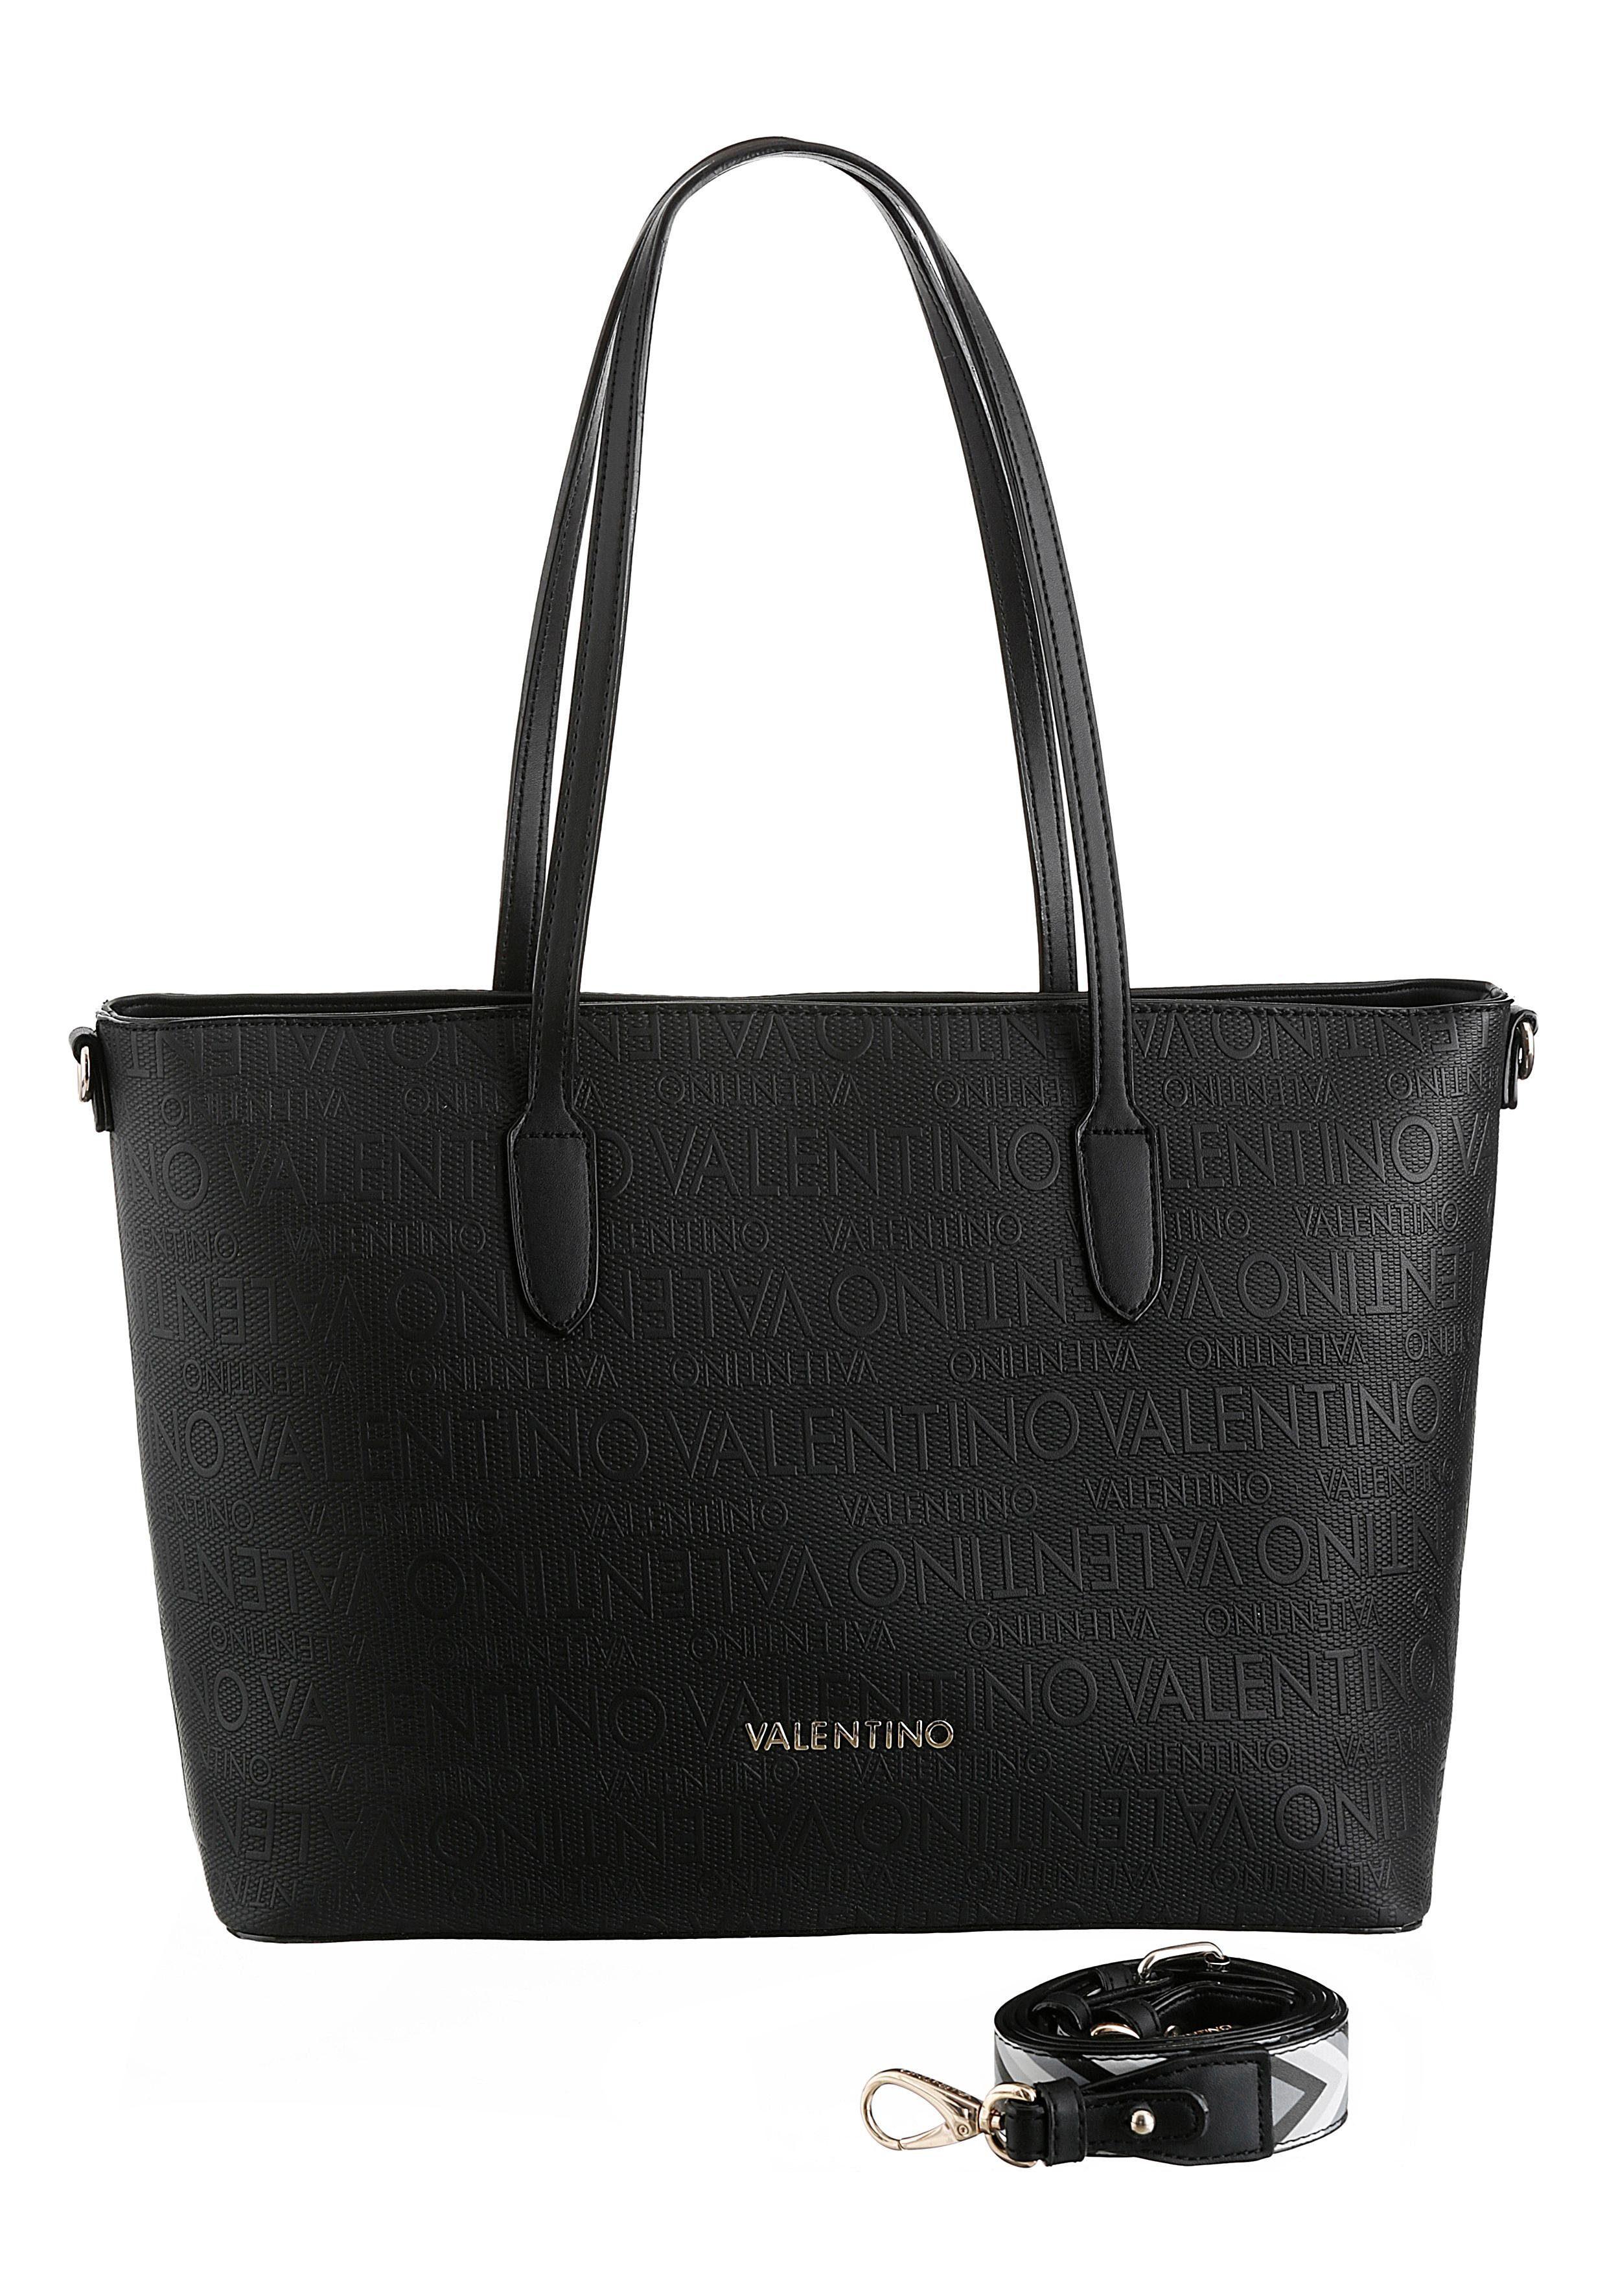 Valentino handbags Shopper »Dory«, mit schickem Marken-Logo